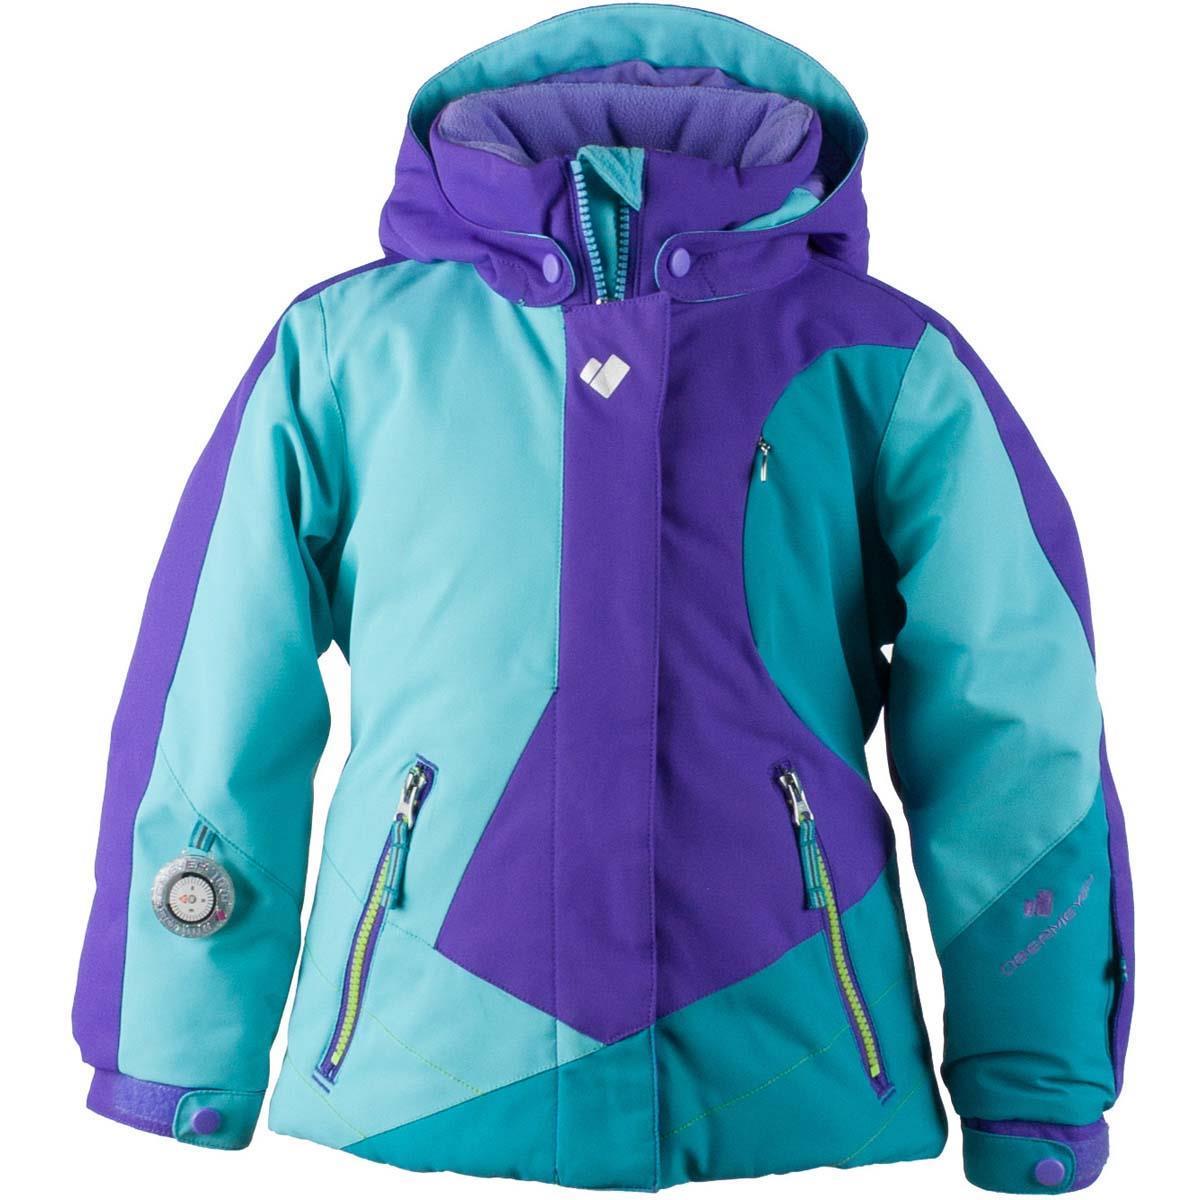 6d020b5c3bbf Obermeyer Trina Jacket - Girl s